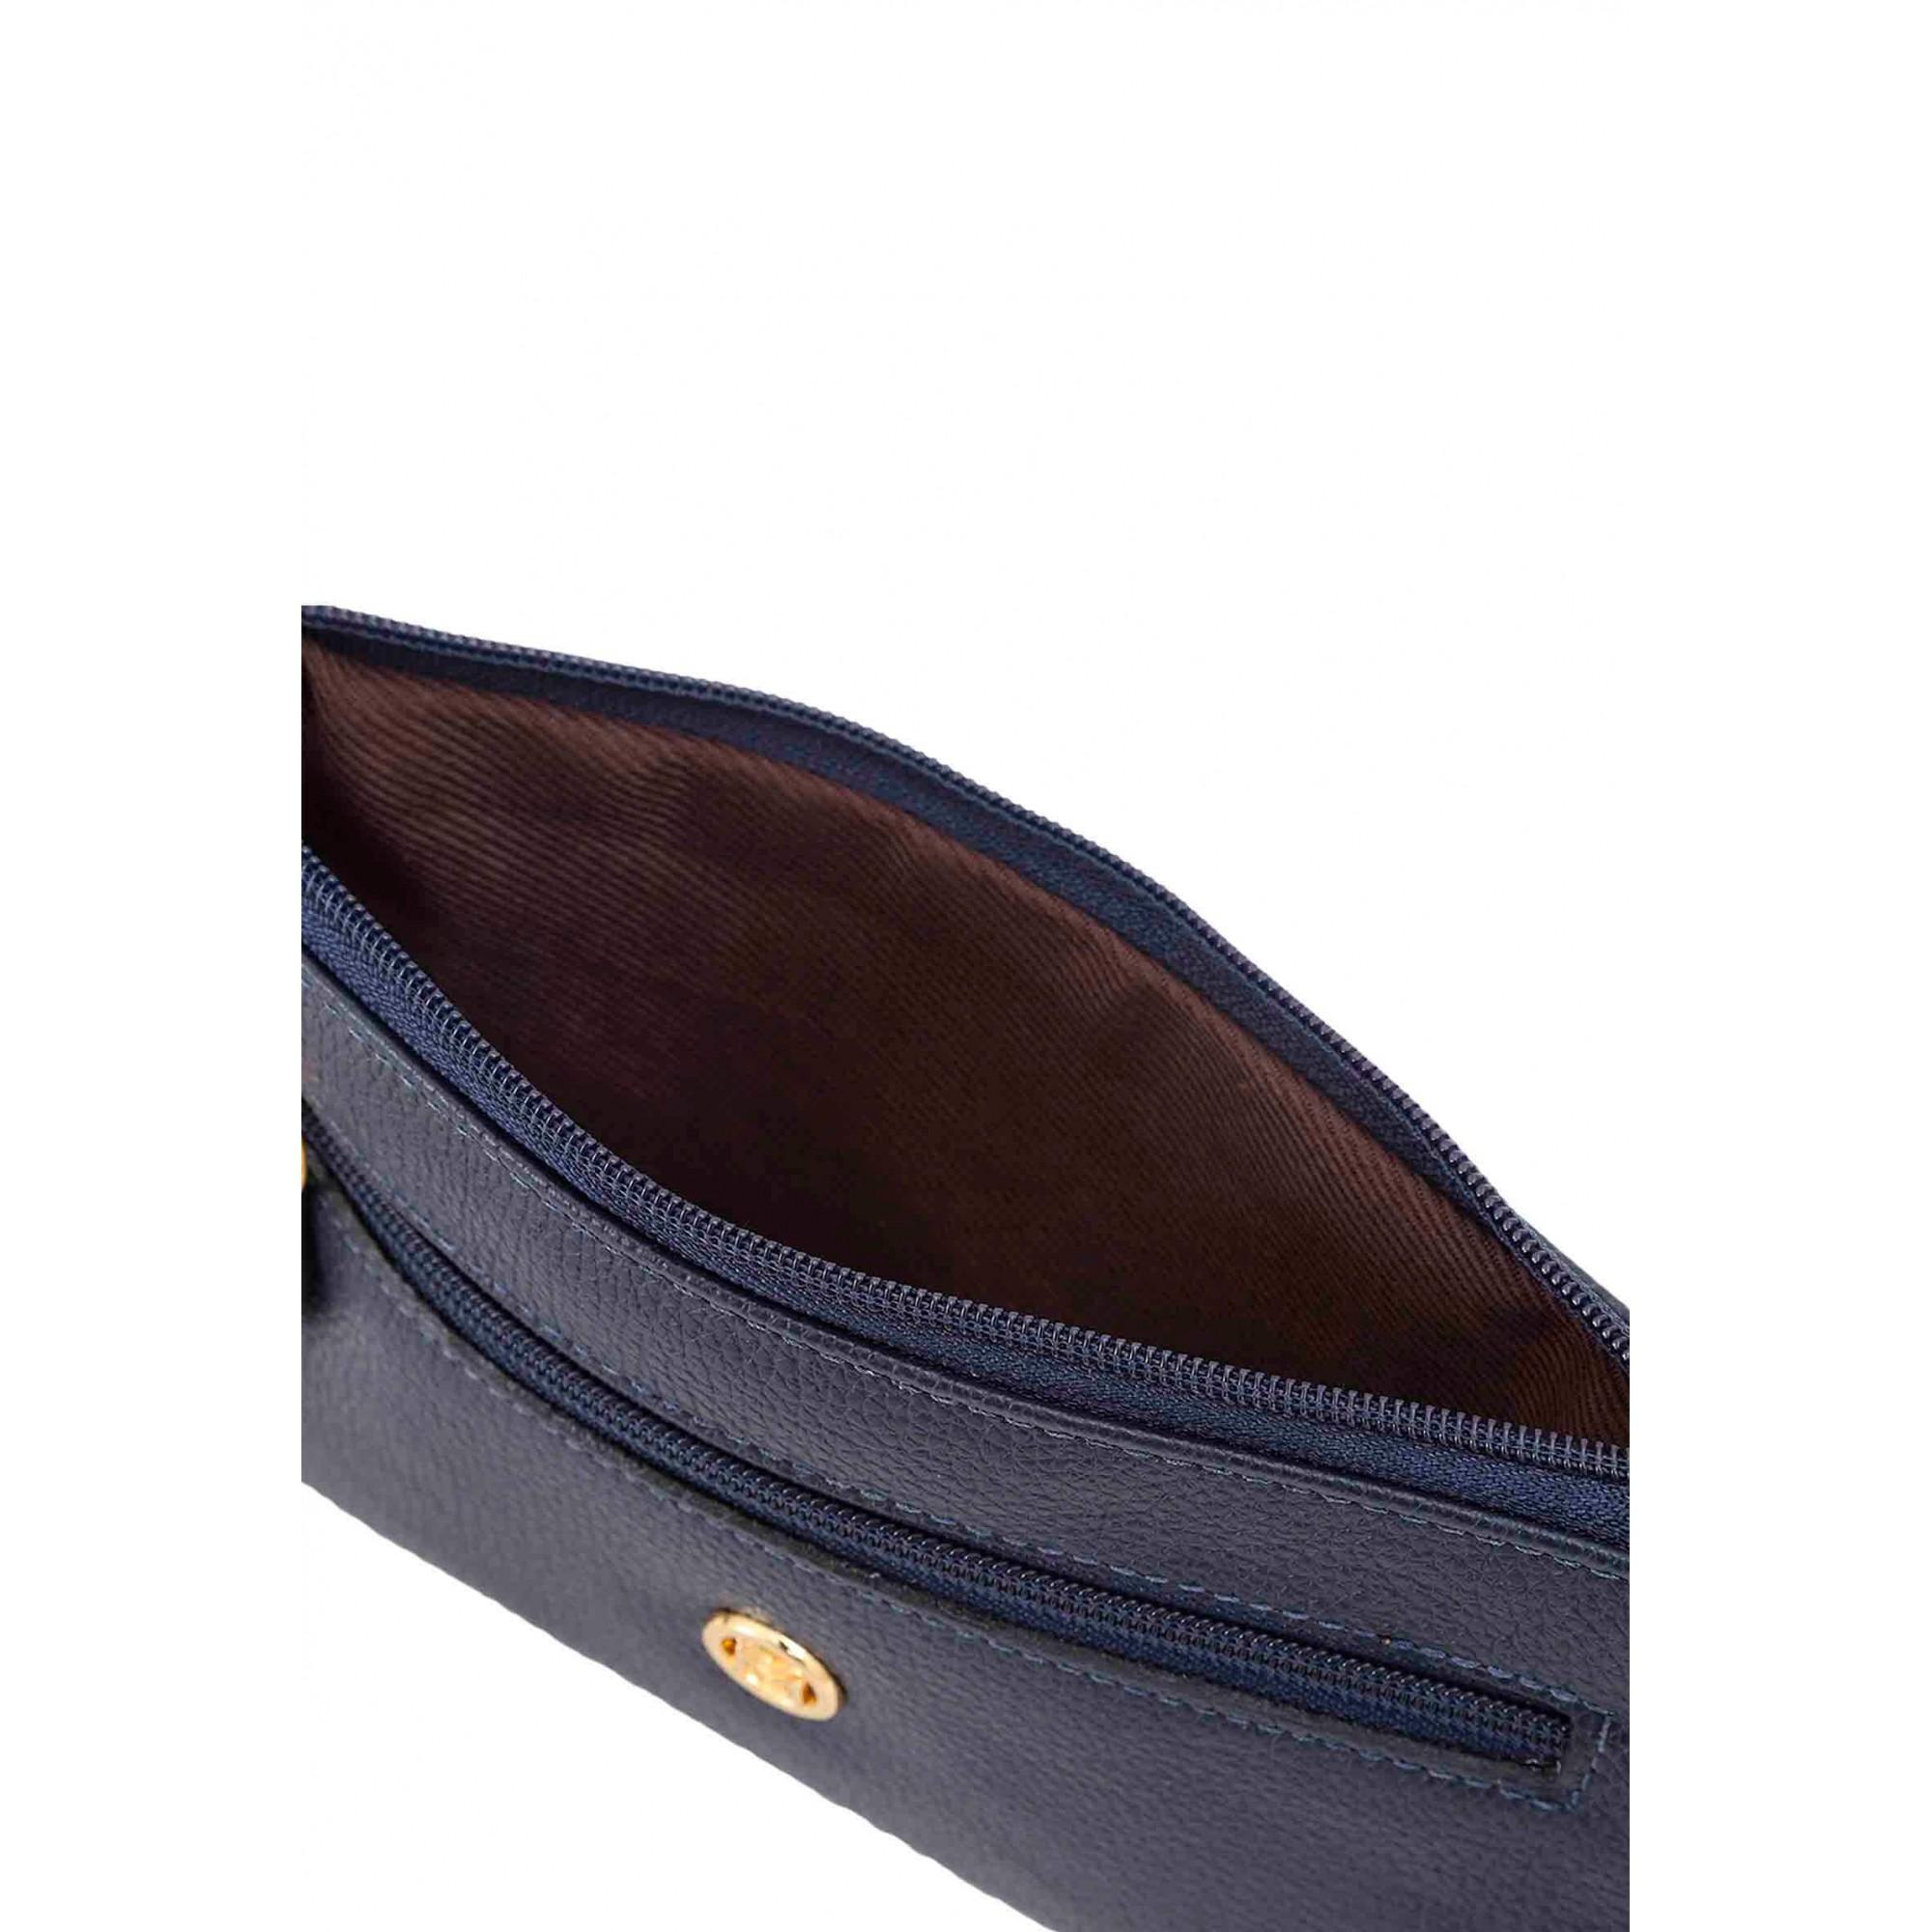 Bolsa Carteira Clutch Couro Mariart 261